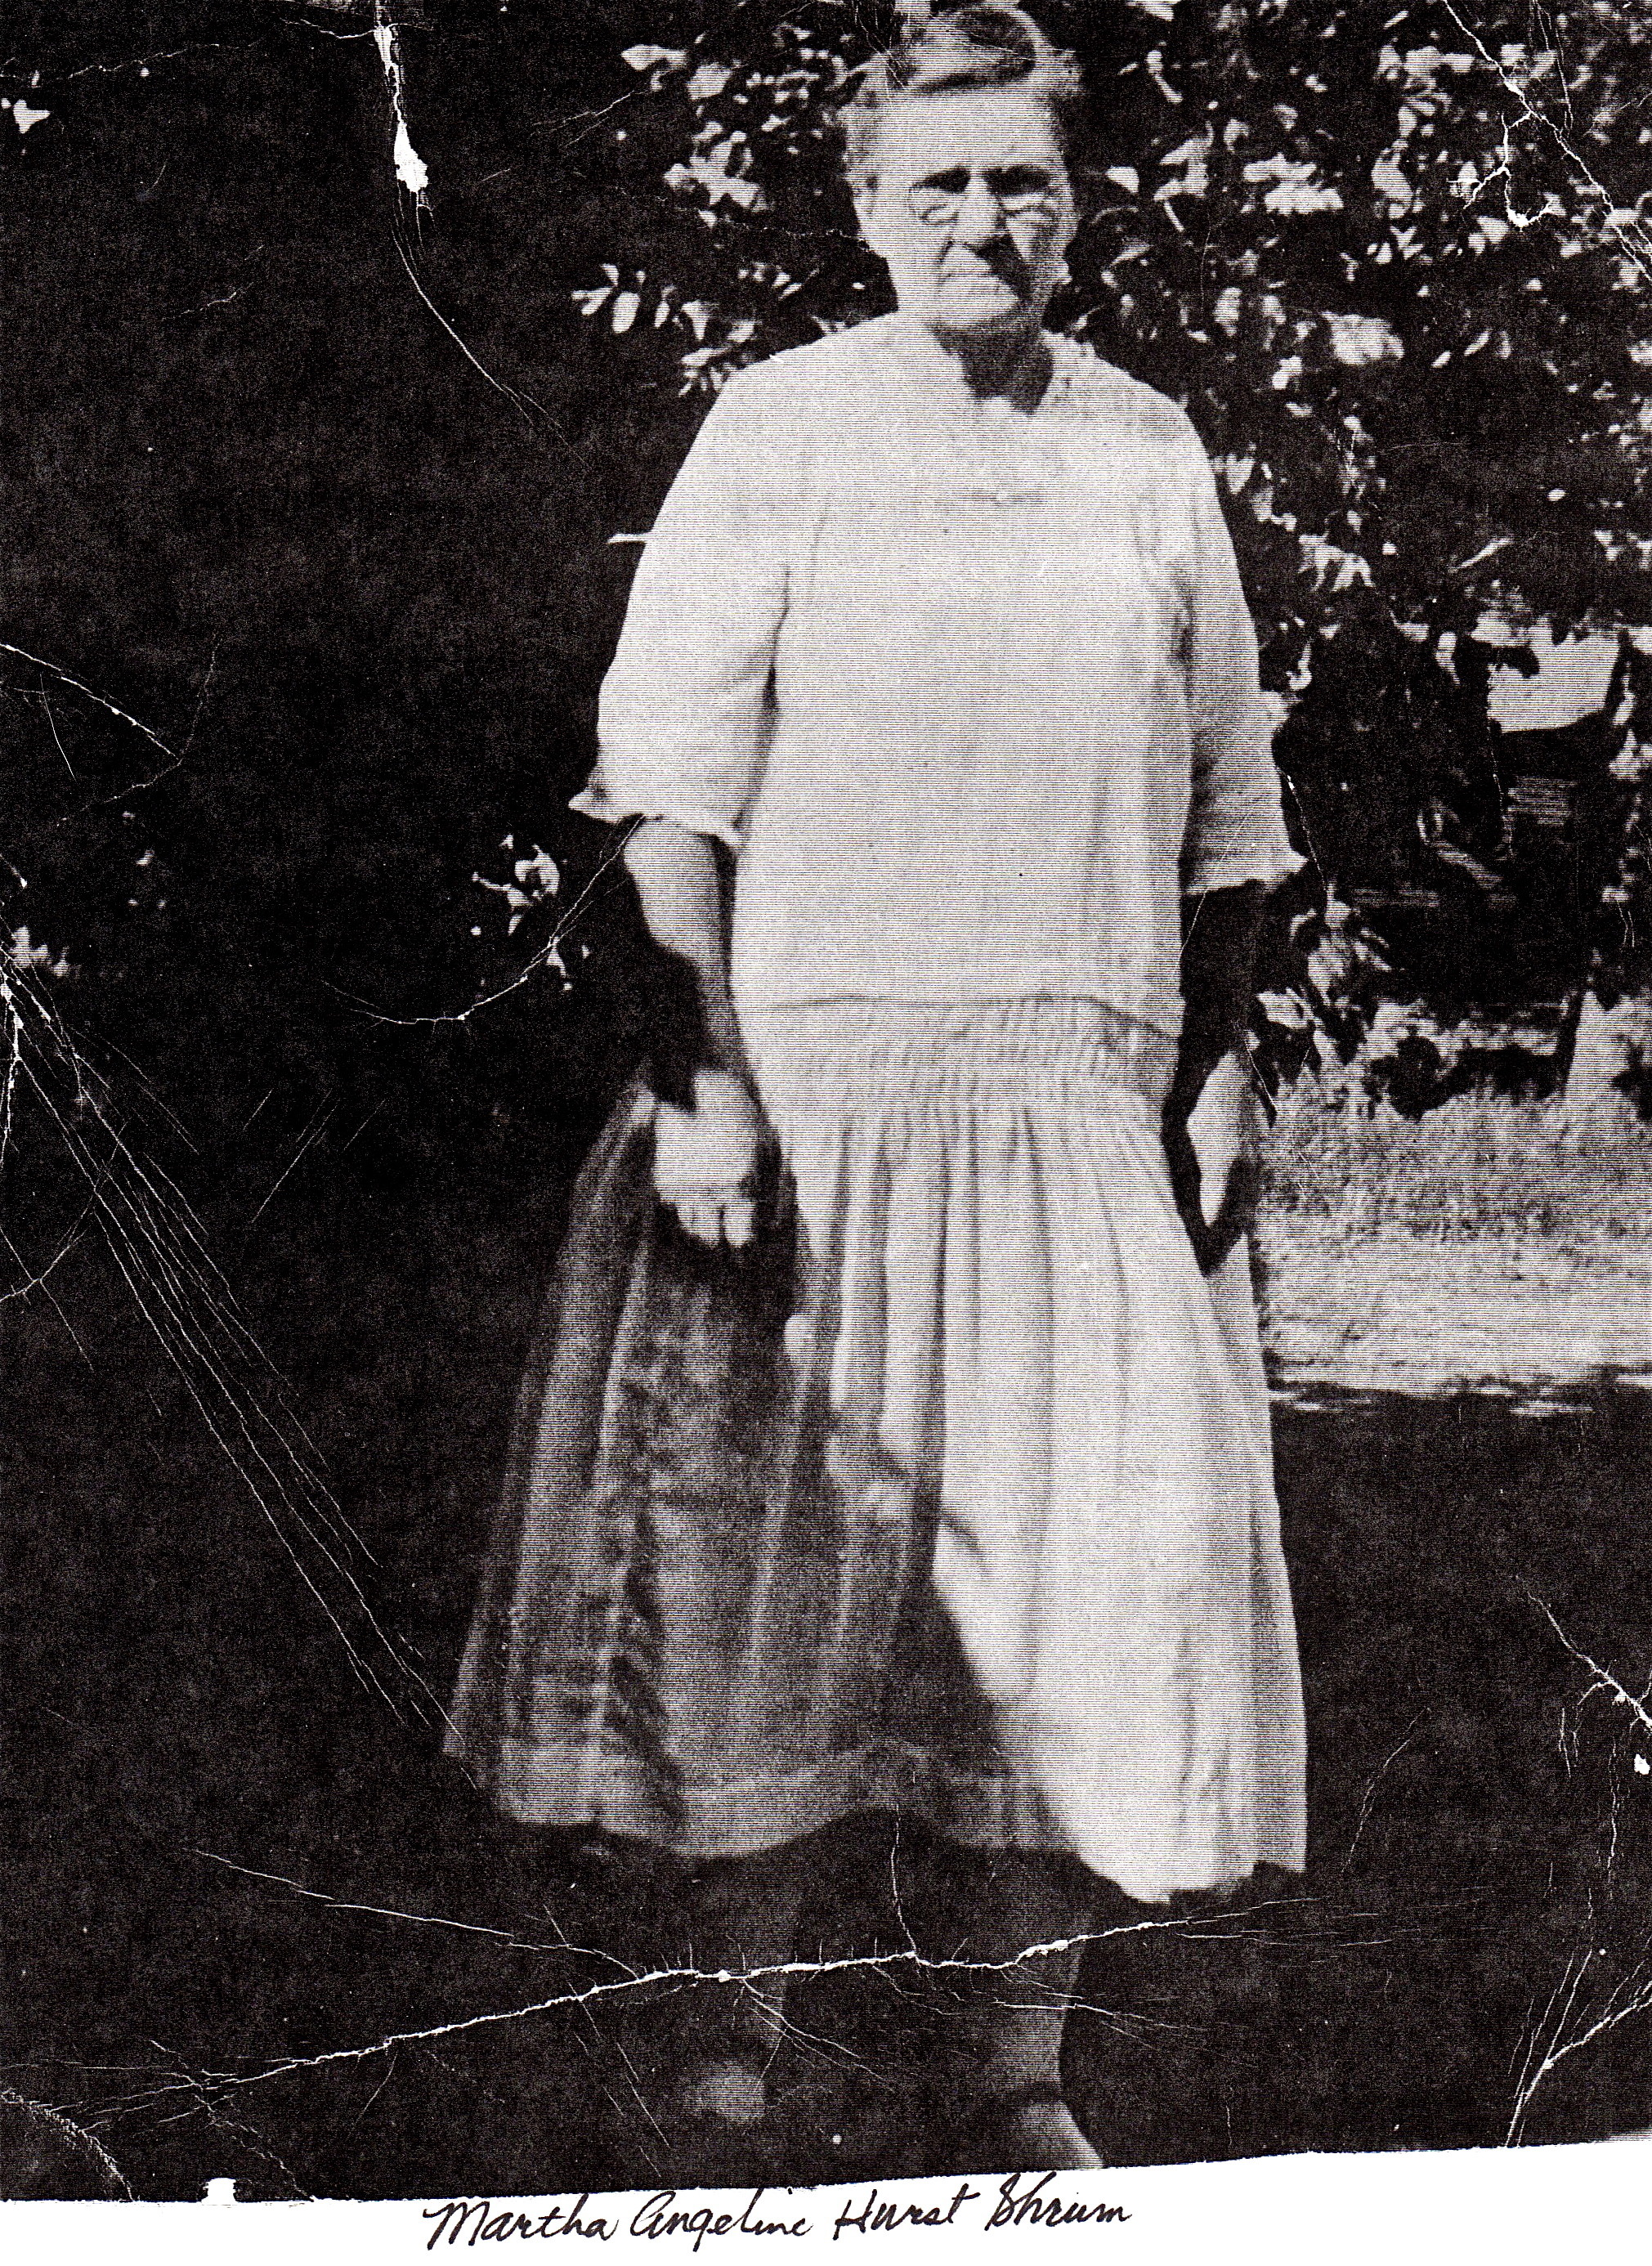 Angeline Hurst